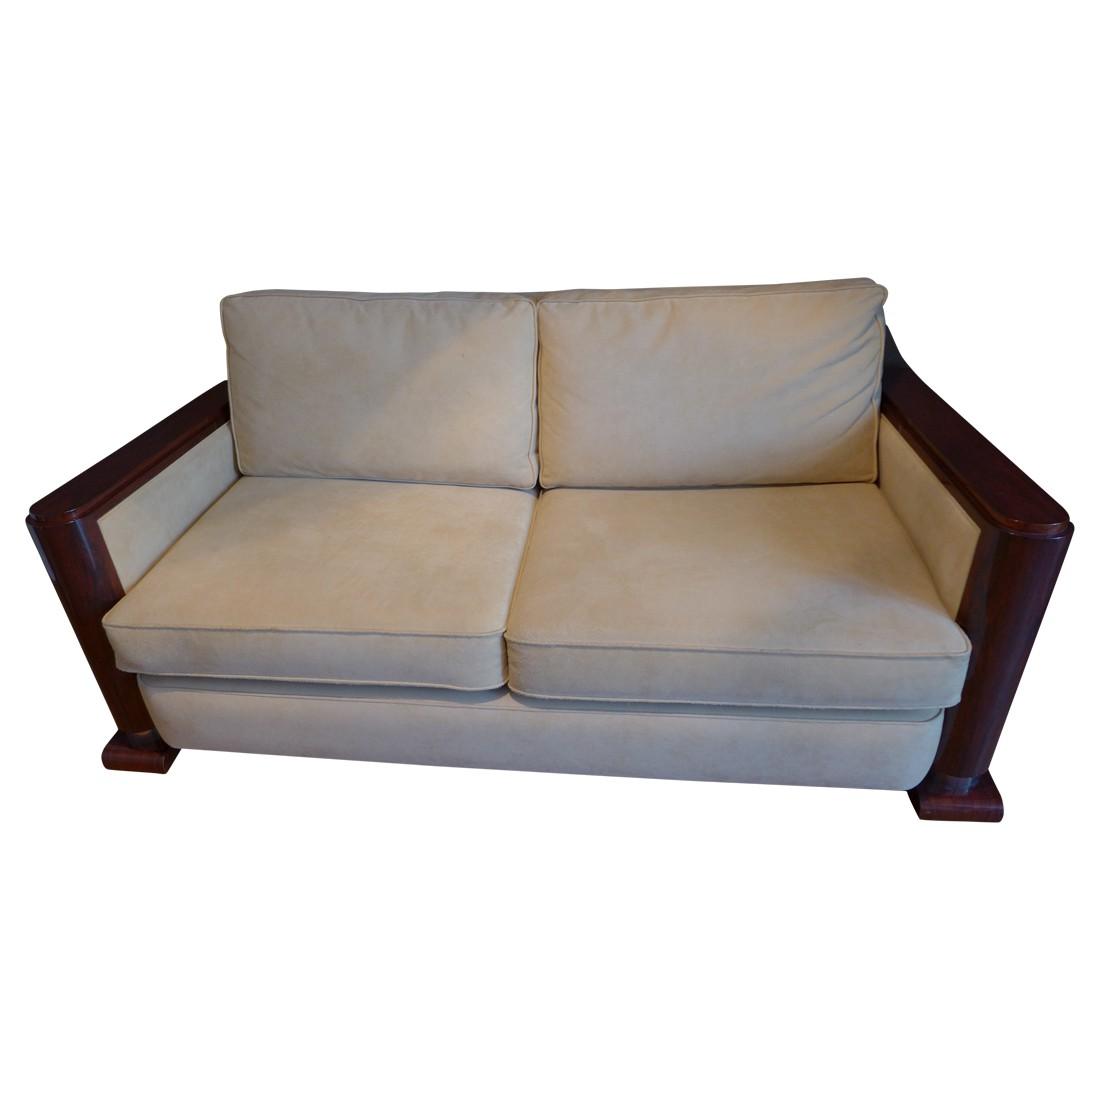 Canapé Convertible Art Deco